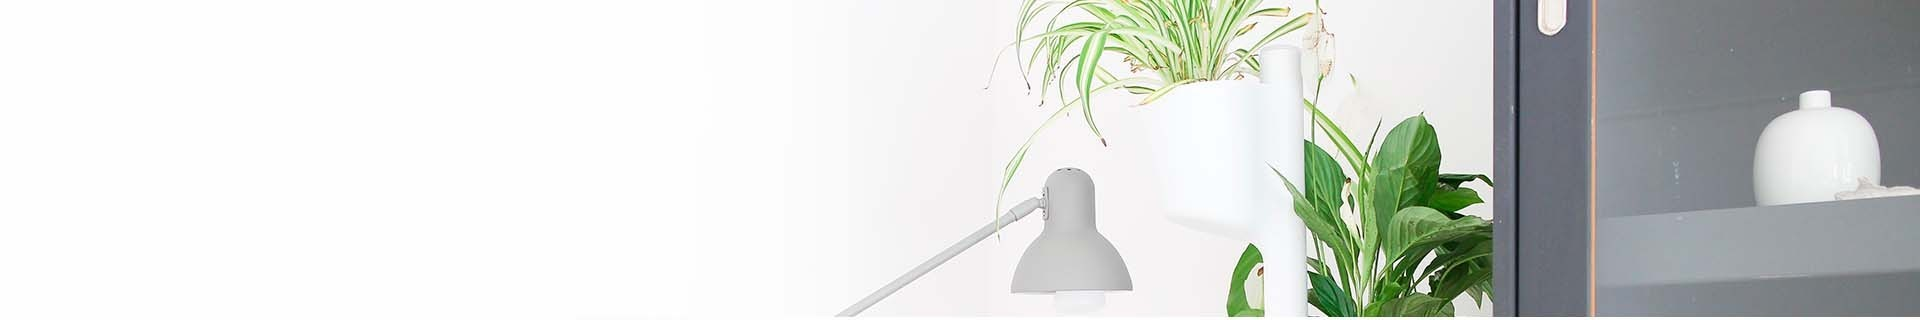 vertikaler Blumentopf mit automatischer Bewässerung | CitySens